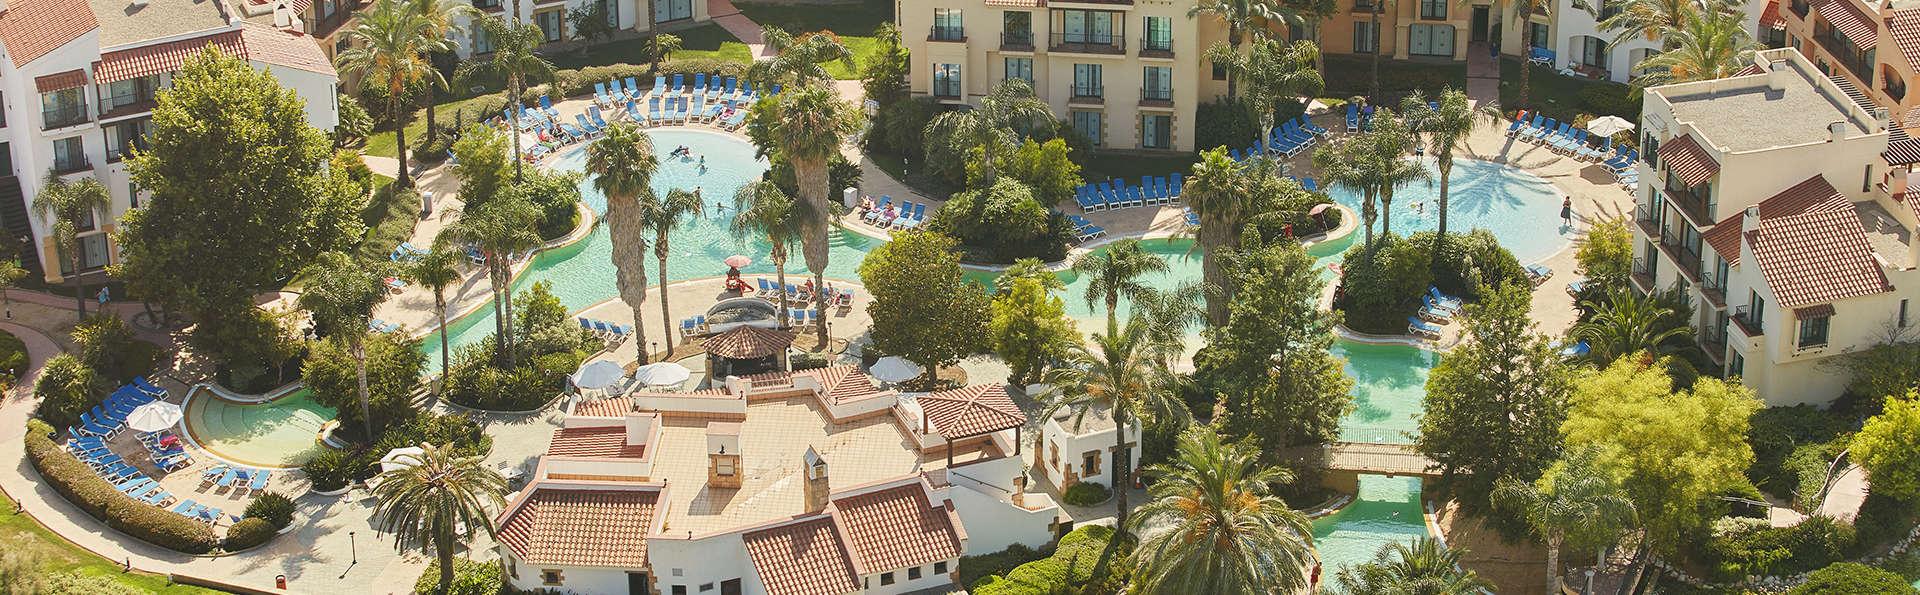 PortAventura Hotel PortAventura - EDIT_AEREAL.jpg